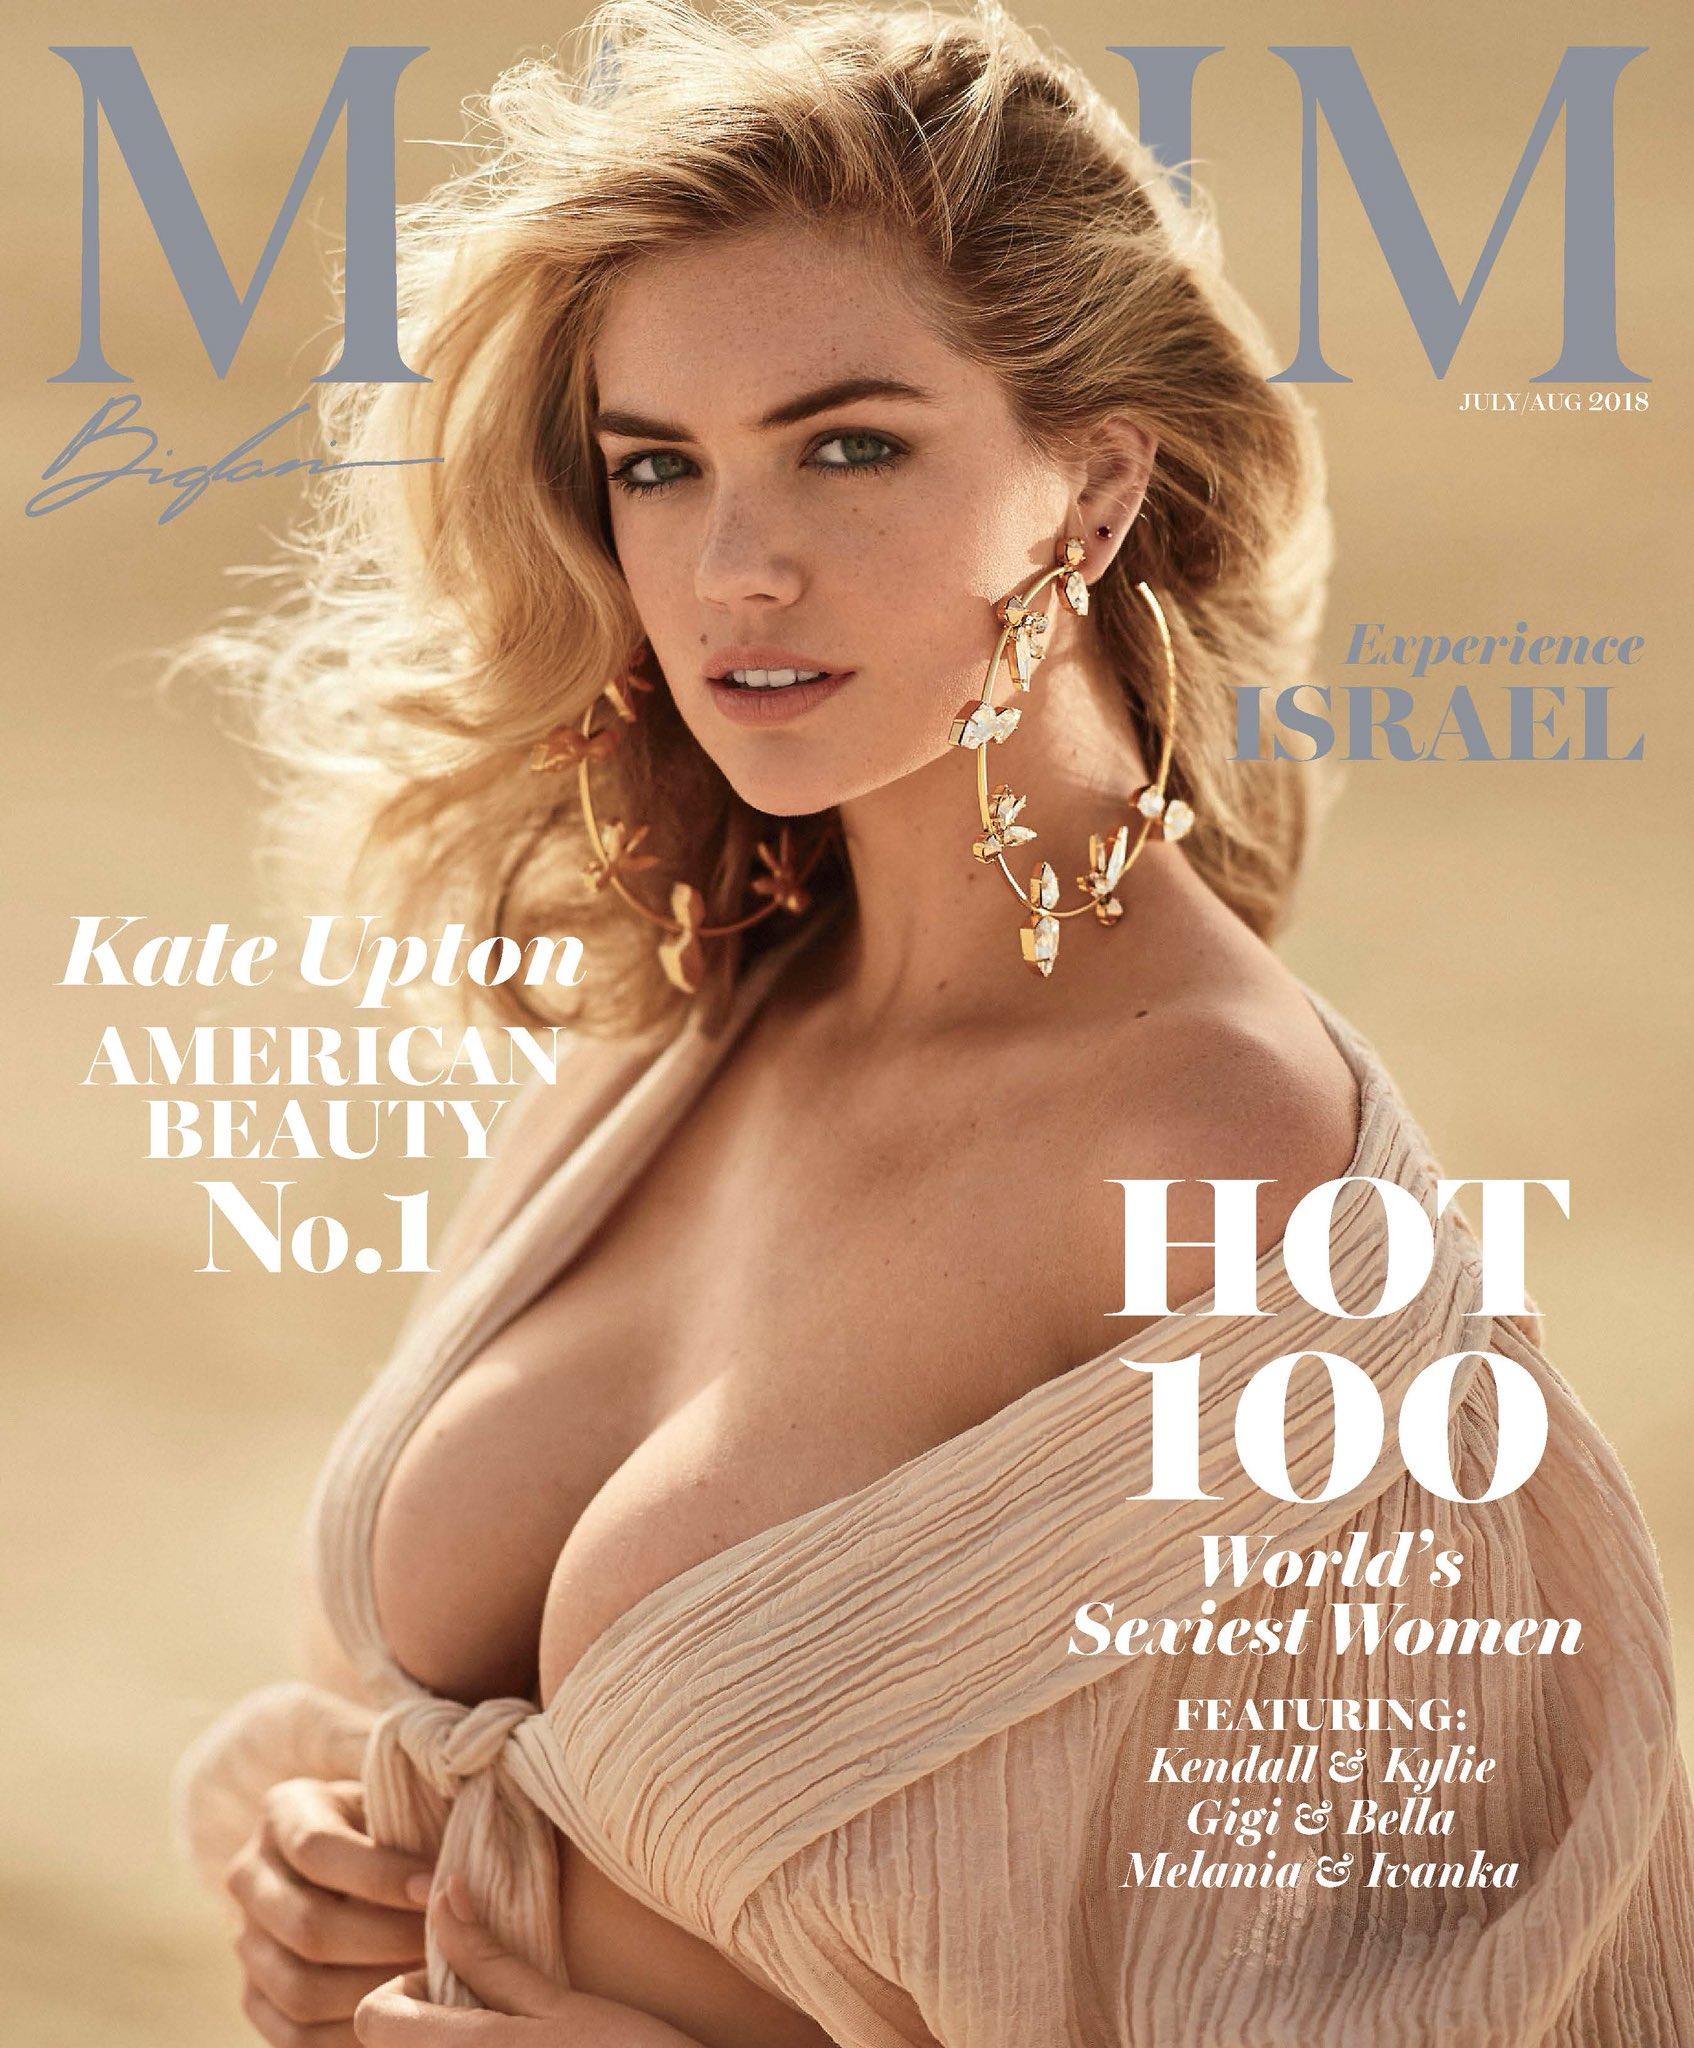 Kate Upton Maxim, Hot 100